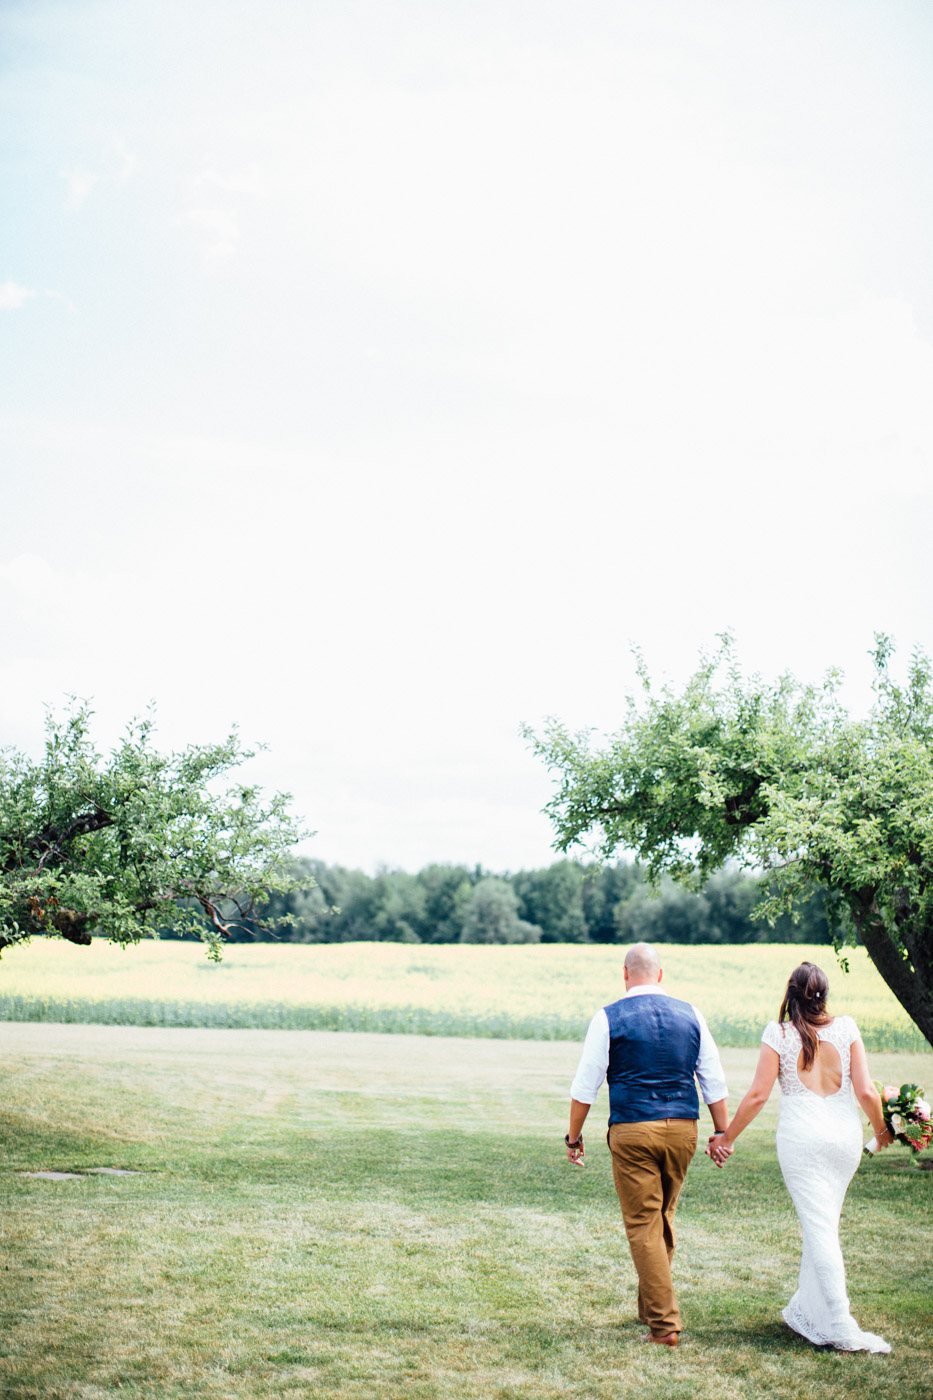 Thera & Barry Wedding 2016-454.jpg